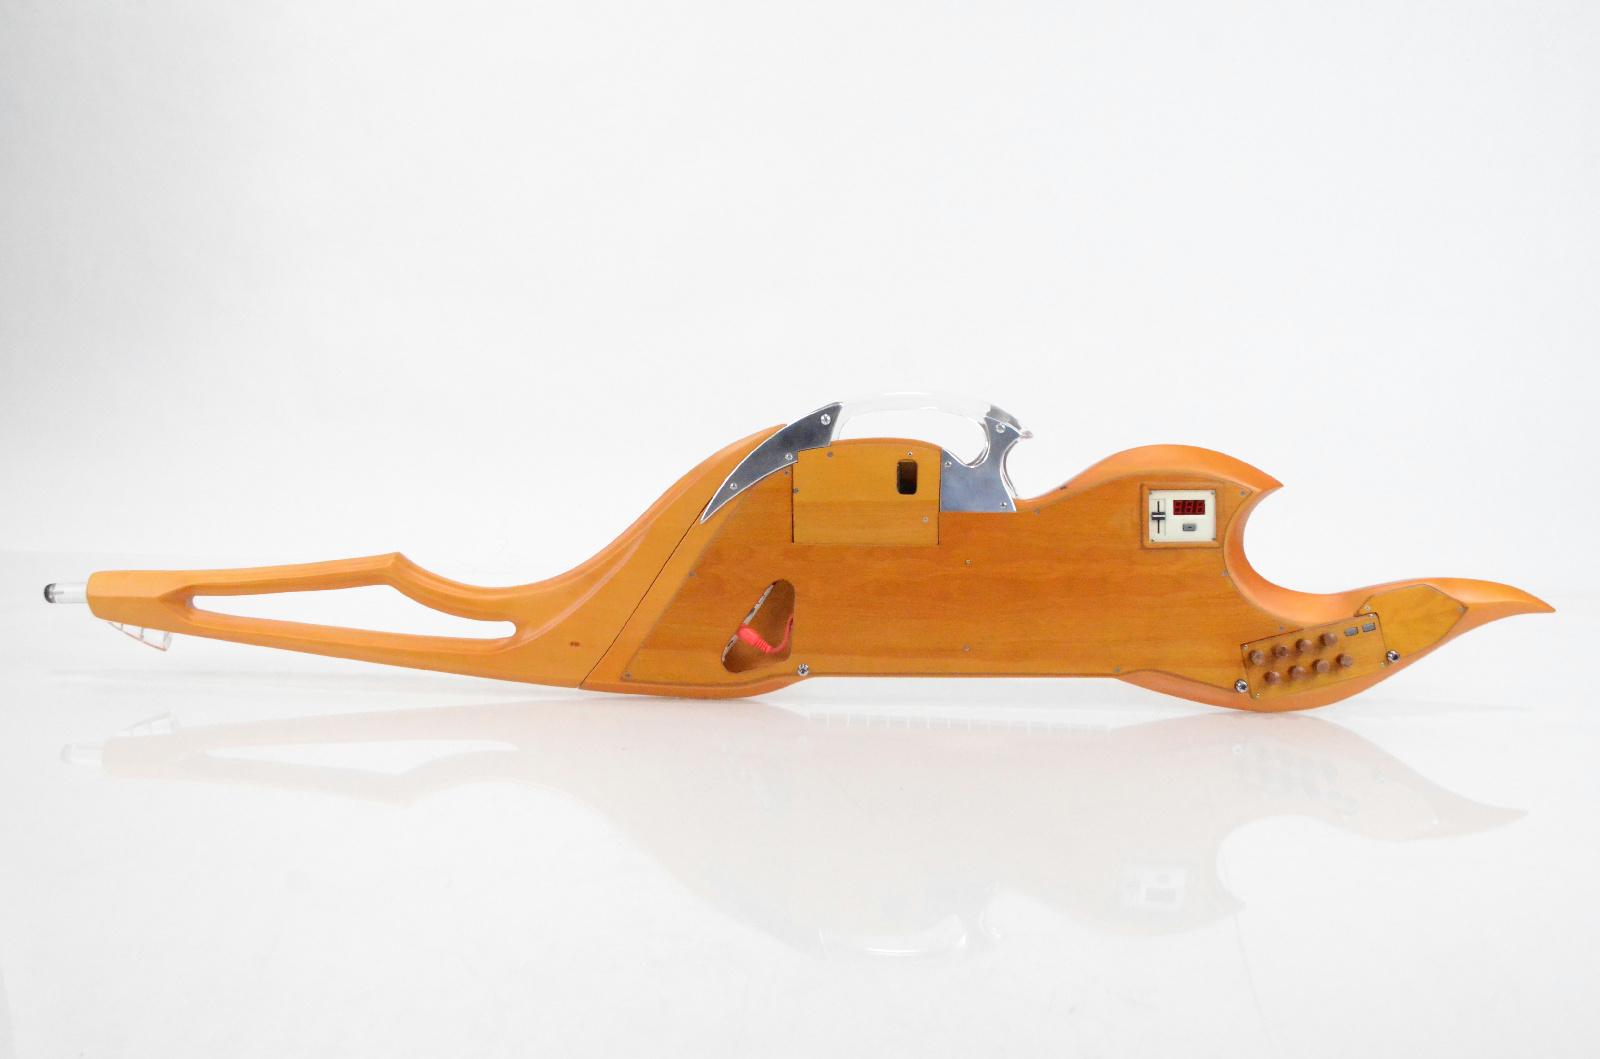 Zen Riffer Z-1 074 MIDI Jet Pro 25-Key Upright Keytar Owned by Maroon 5  #33584